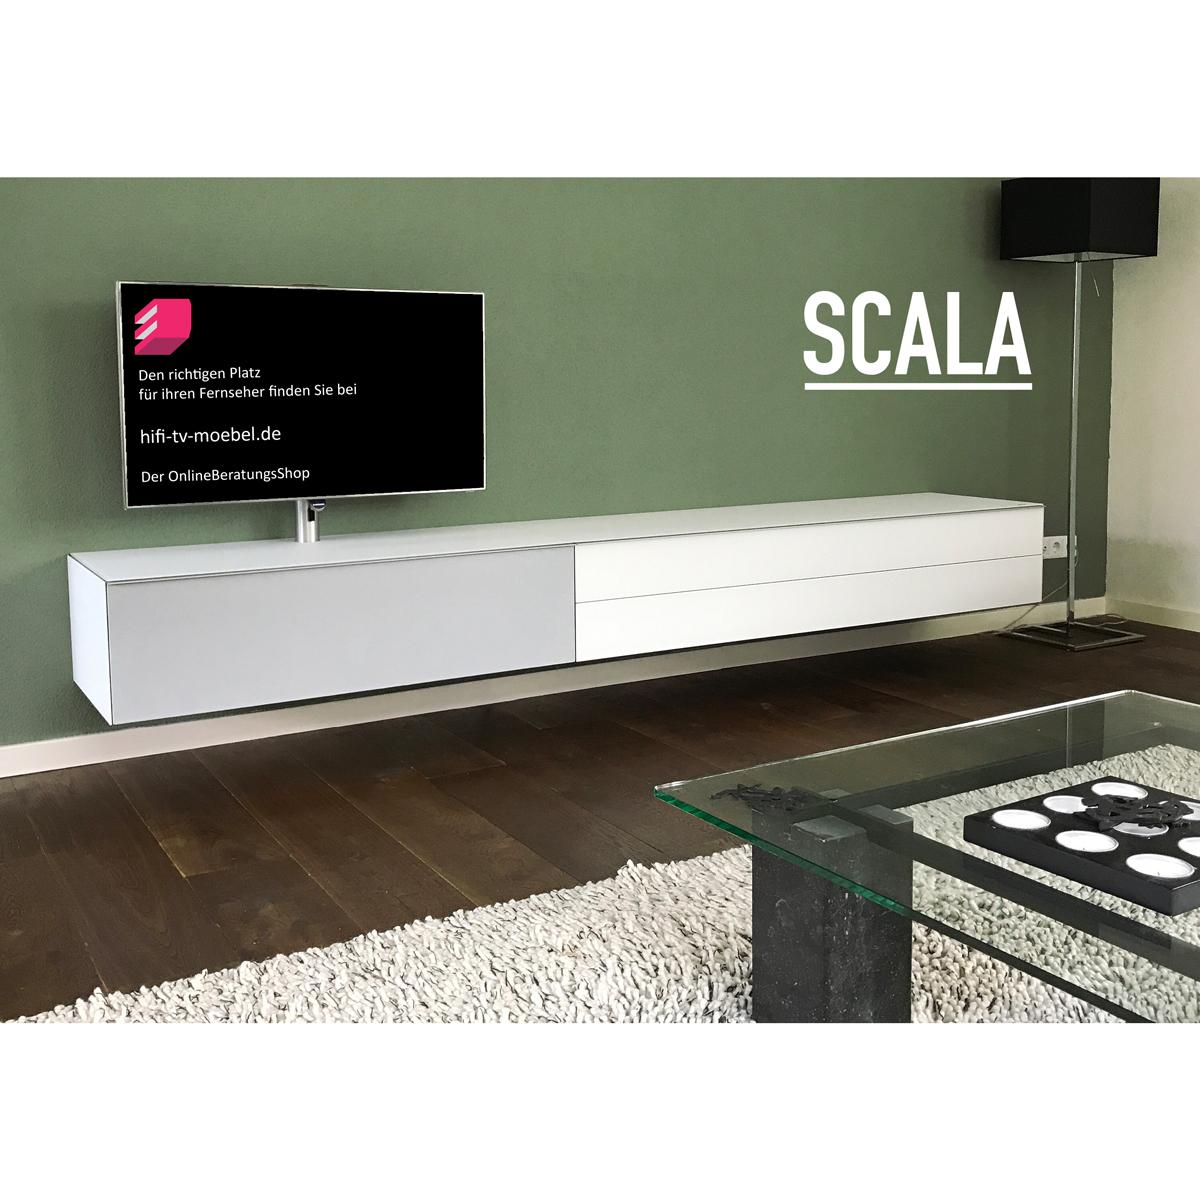 Spectral Scala Sc1104 Sc1106 Sc1654 Sc1656 Br Soundbar Mobel Fur Sonos Bose Und Andere Bei Hifi Tv Moebel De